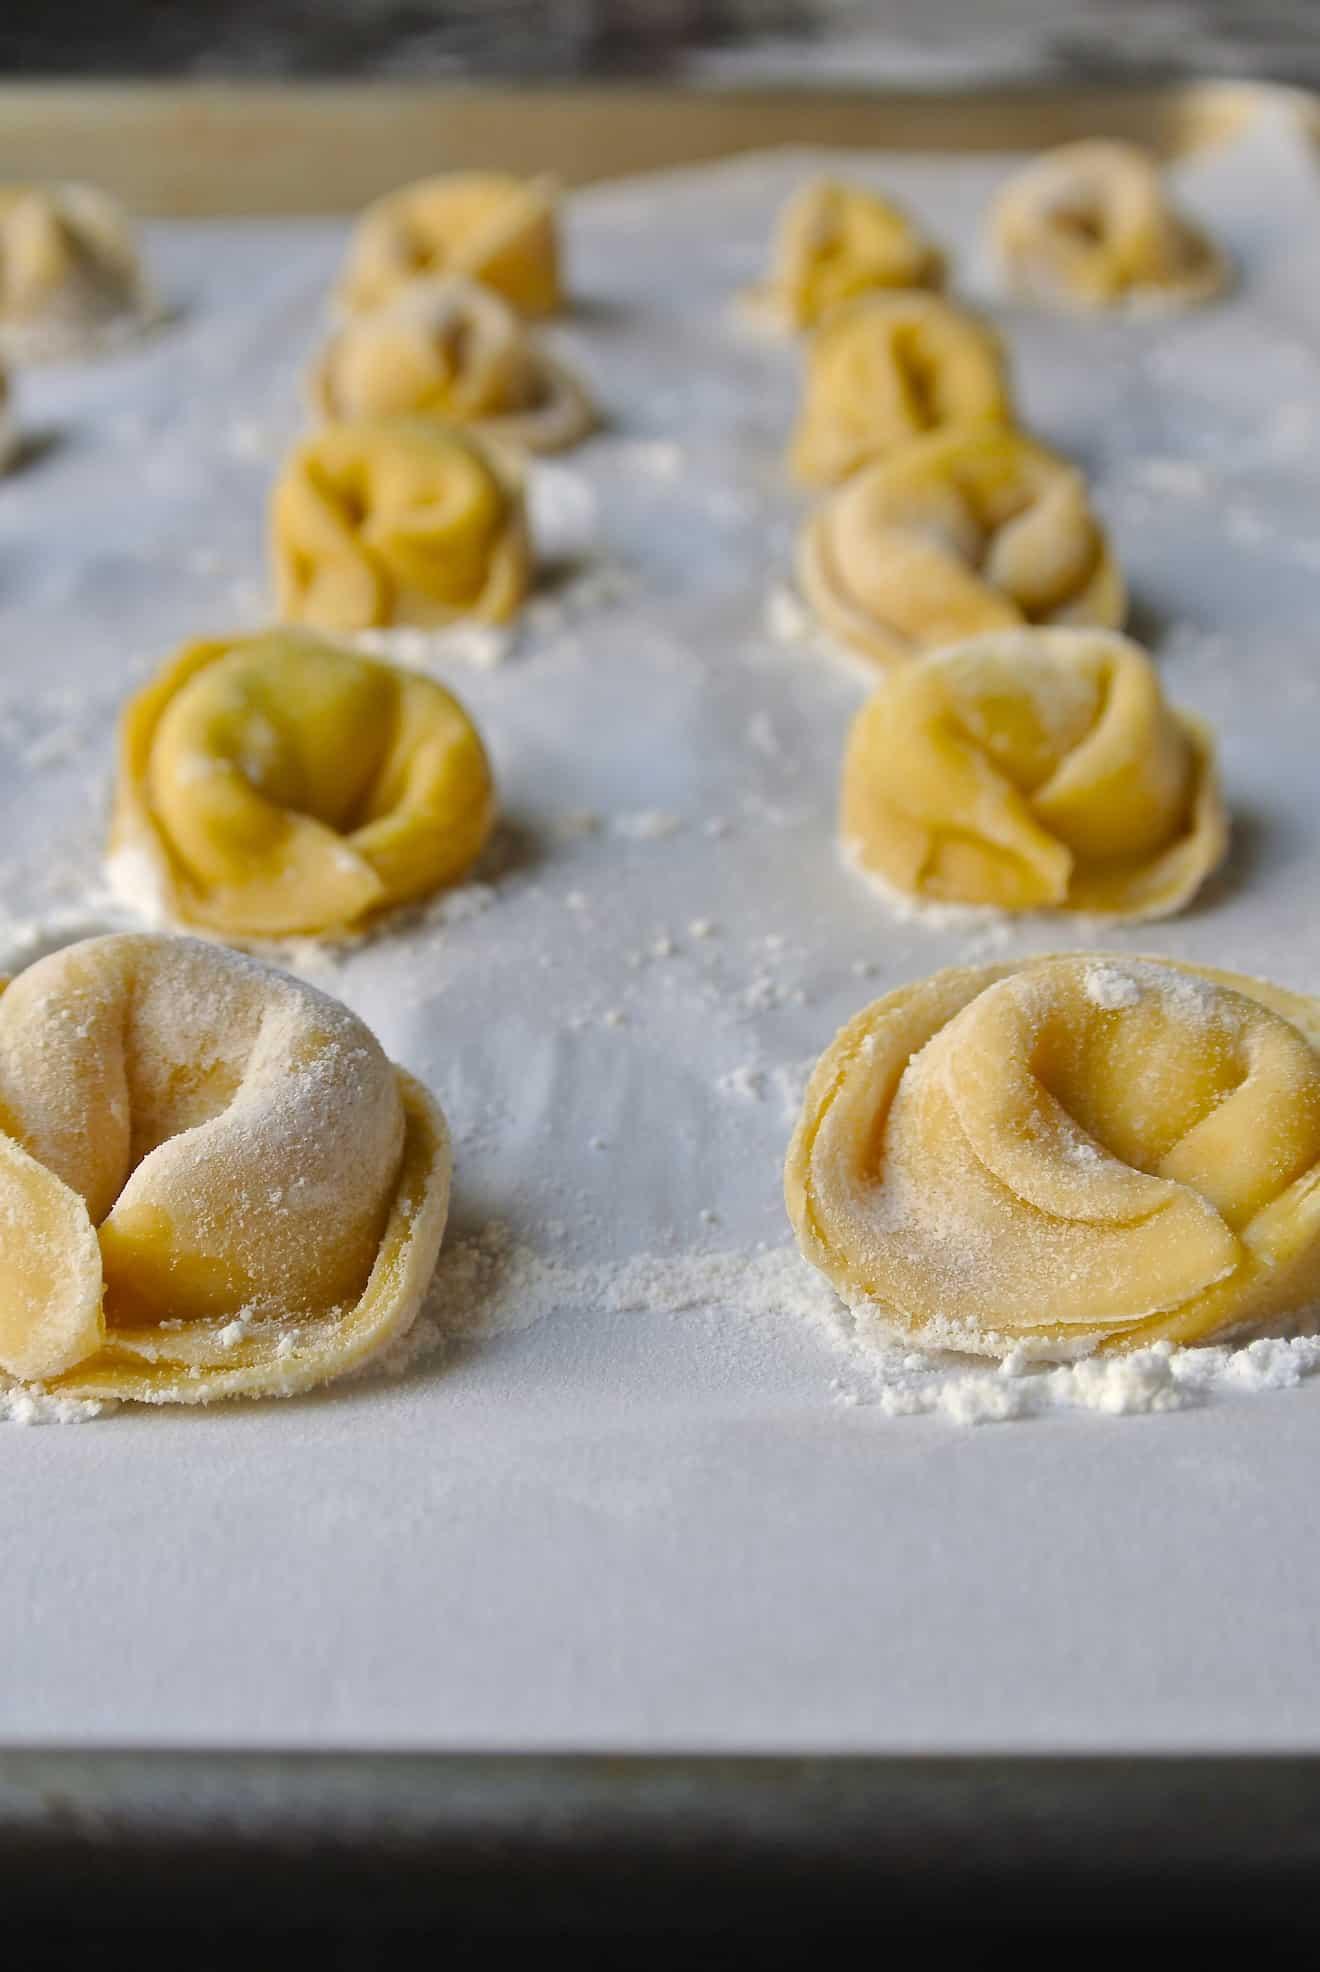 Freshly made cheese tortellini